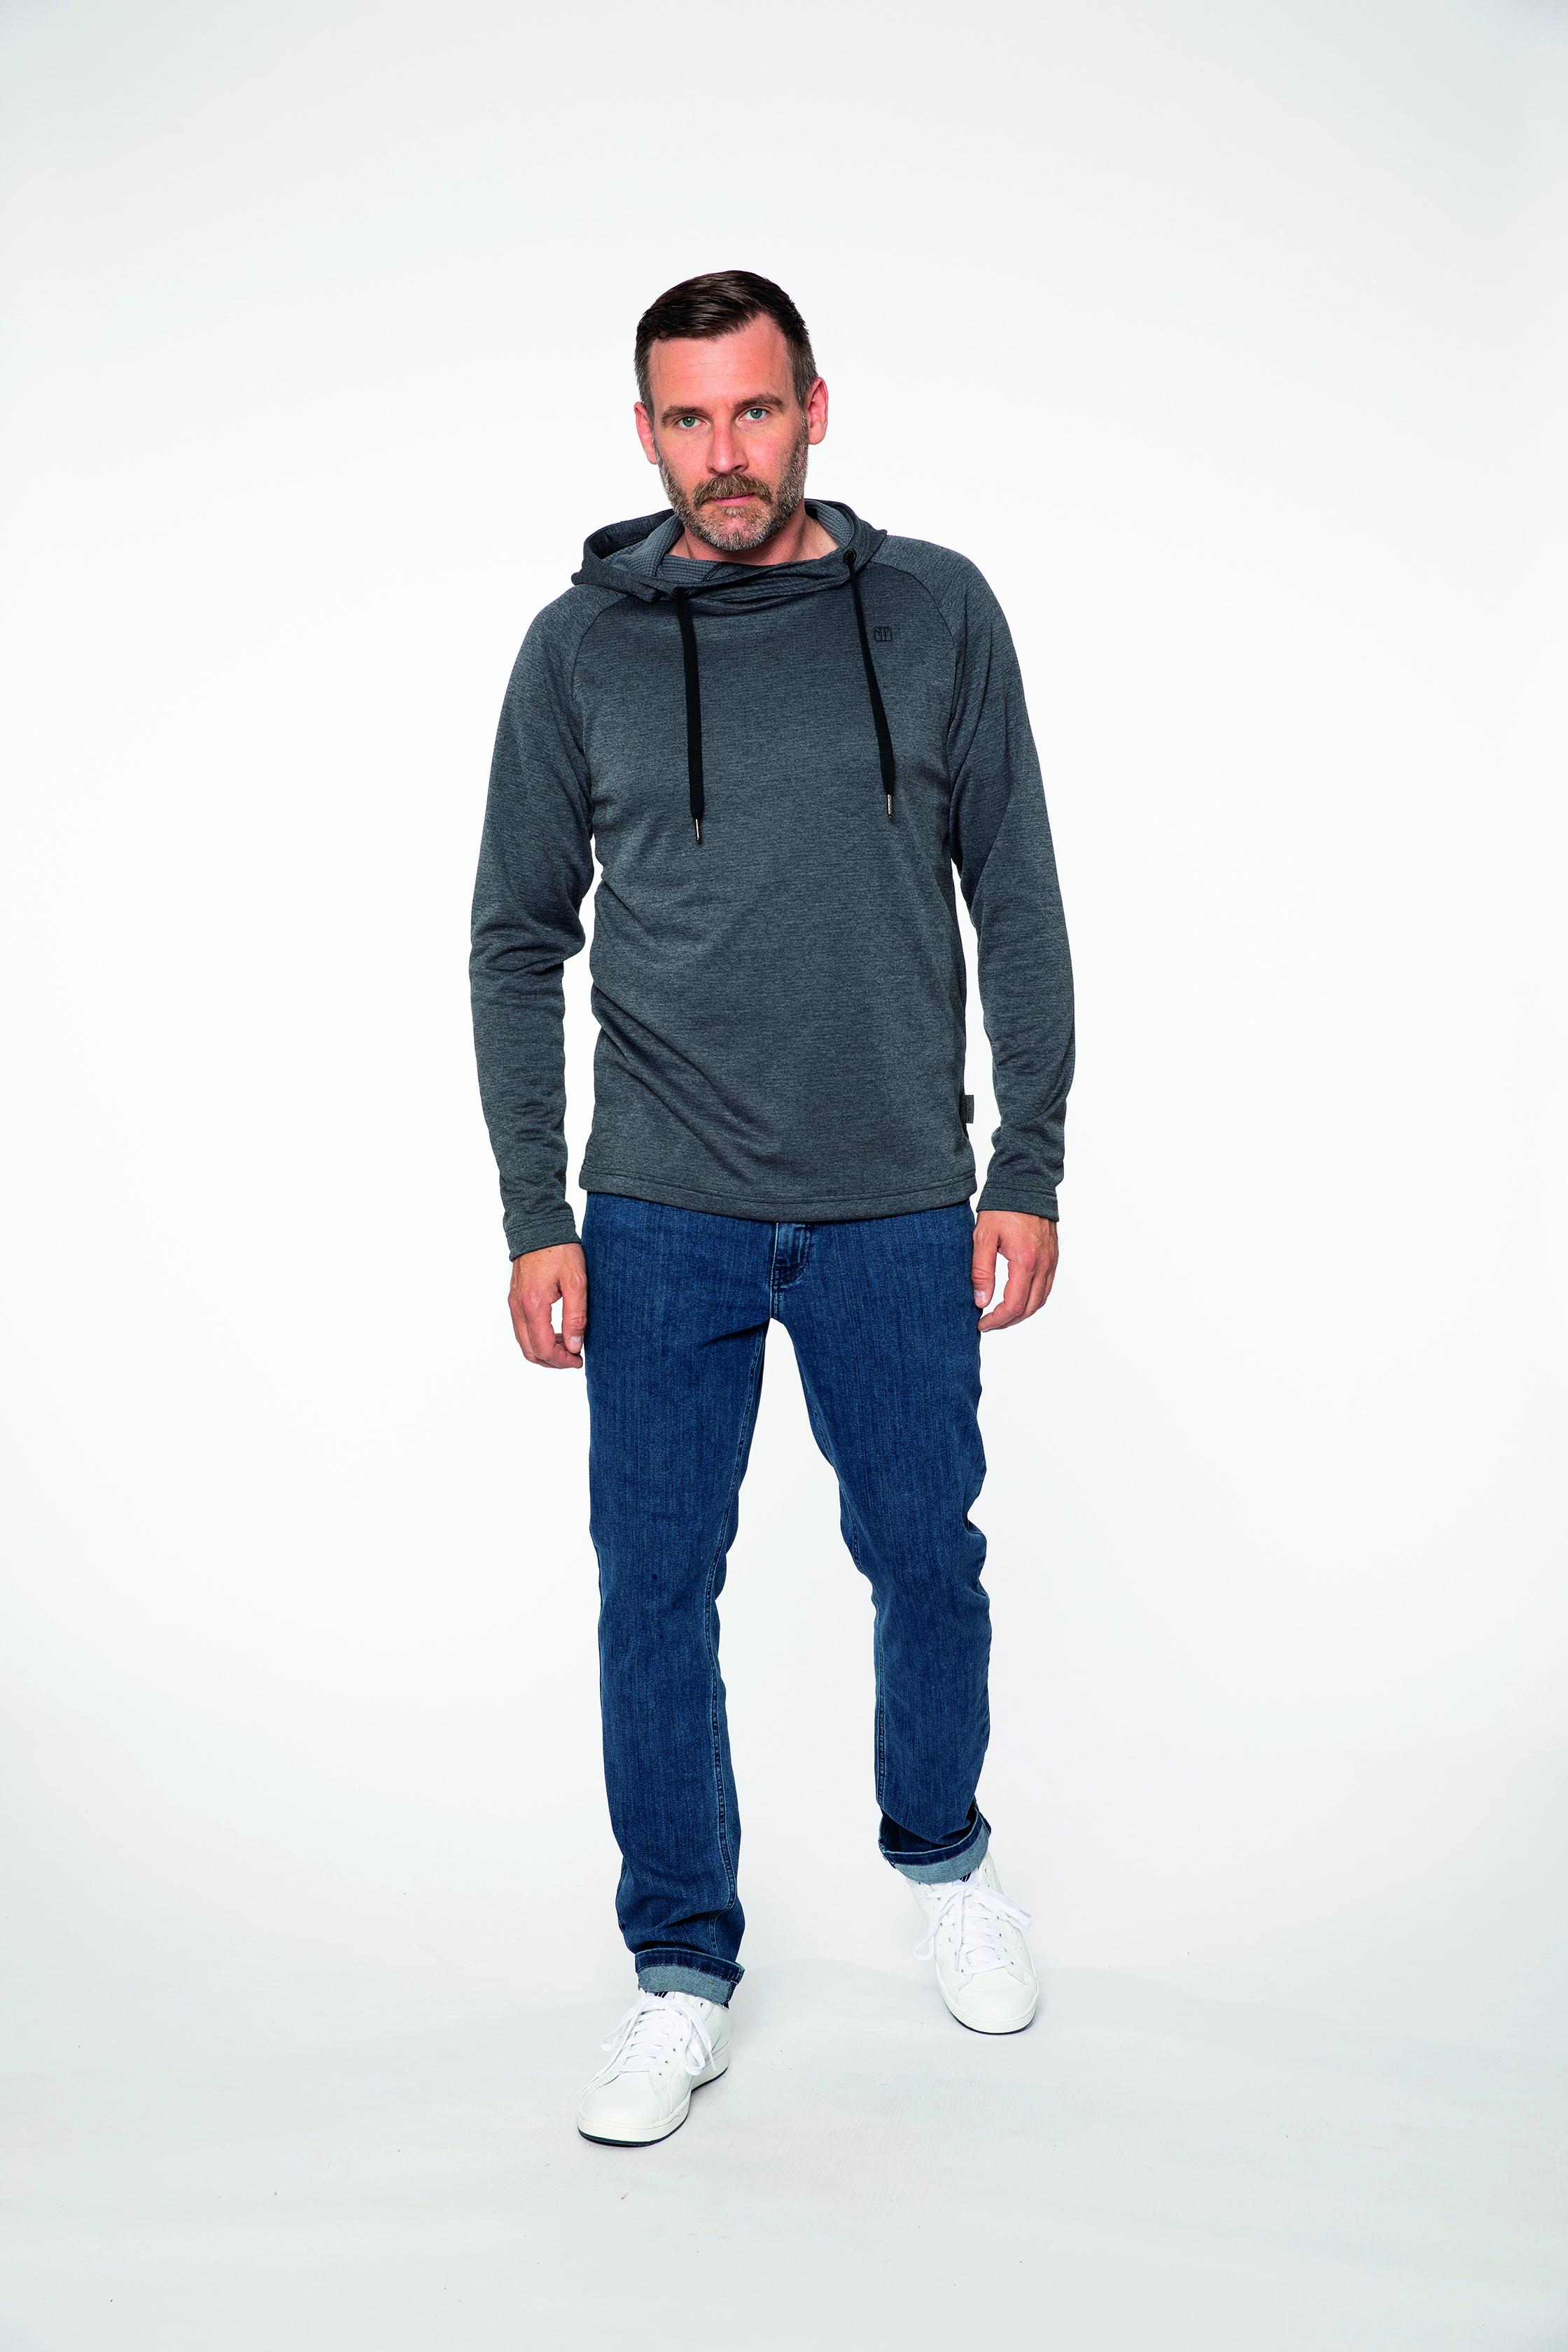 fleece pullover:  SOMEWHERE   denim pants:  COMPAGNON